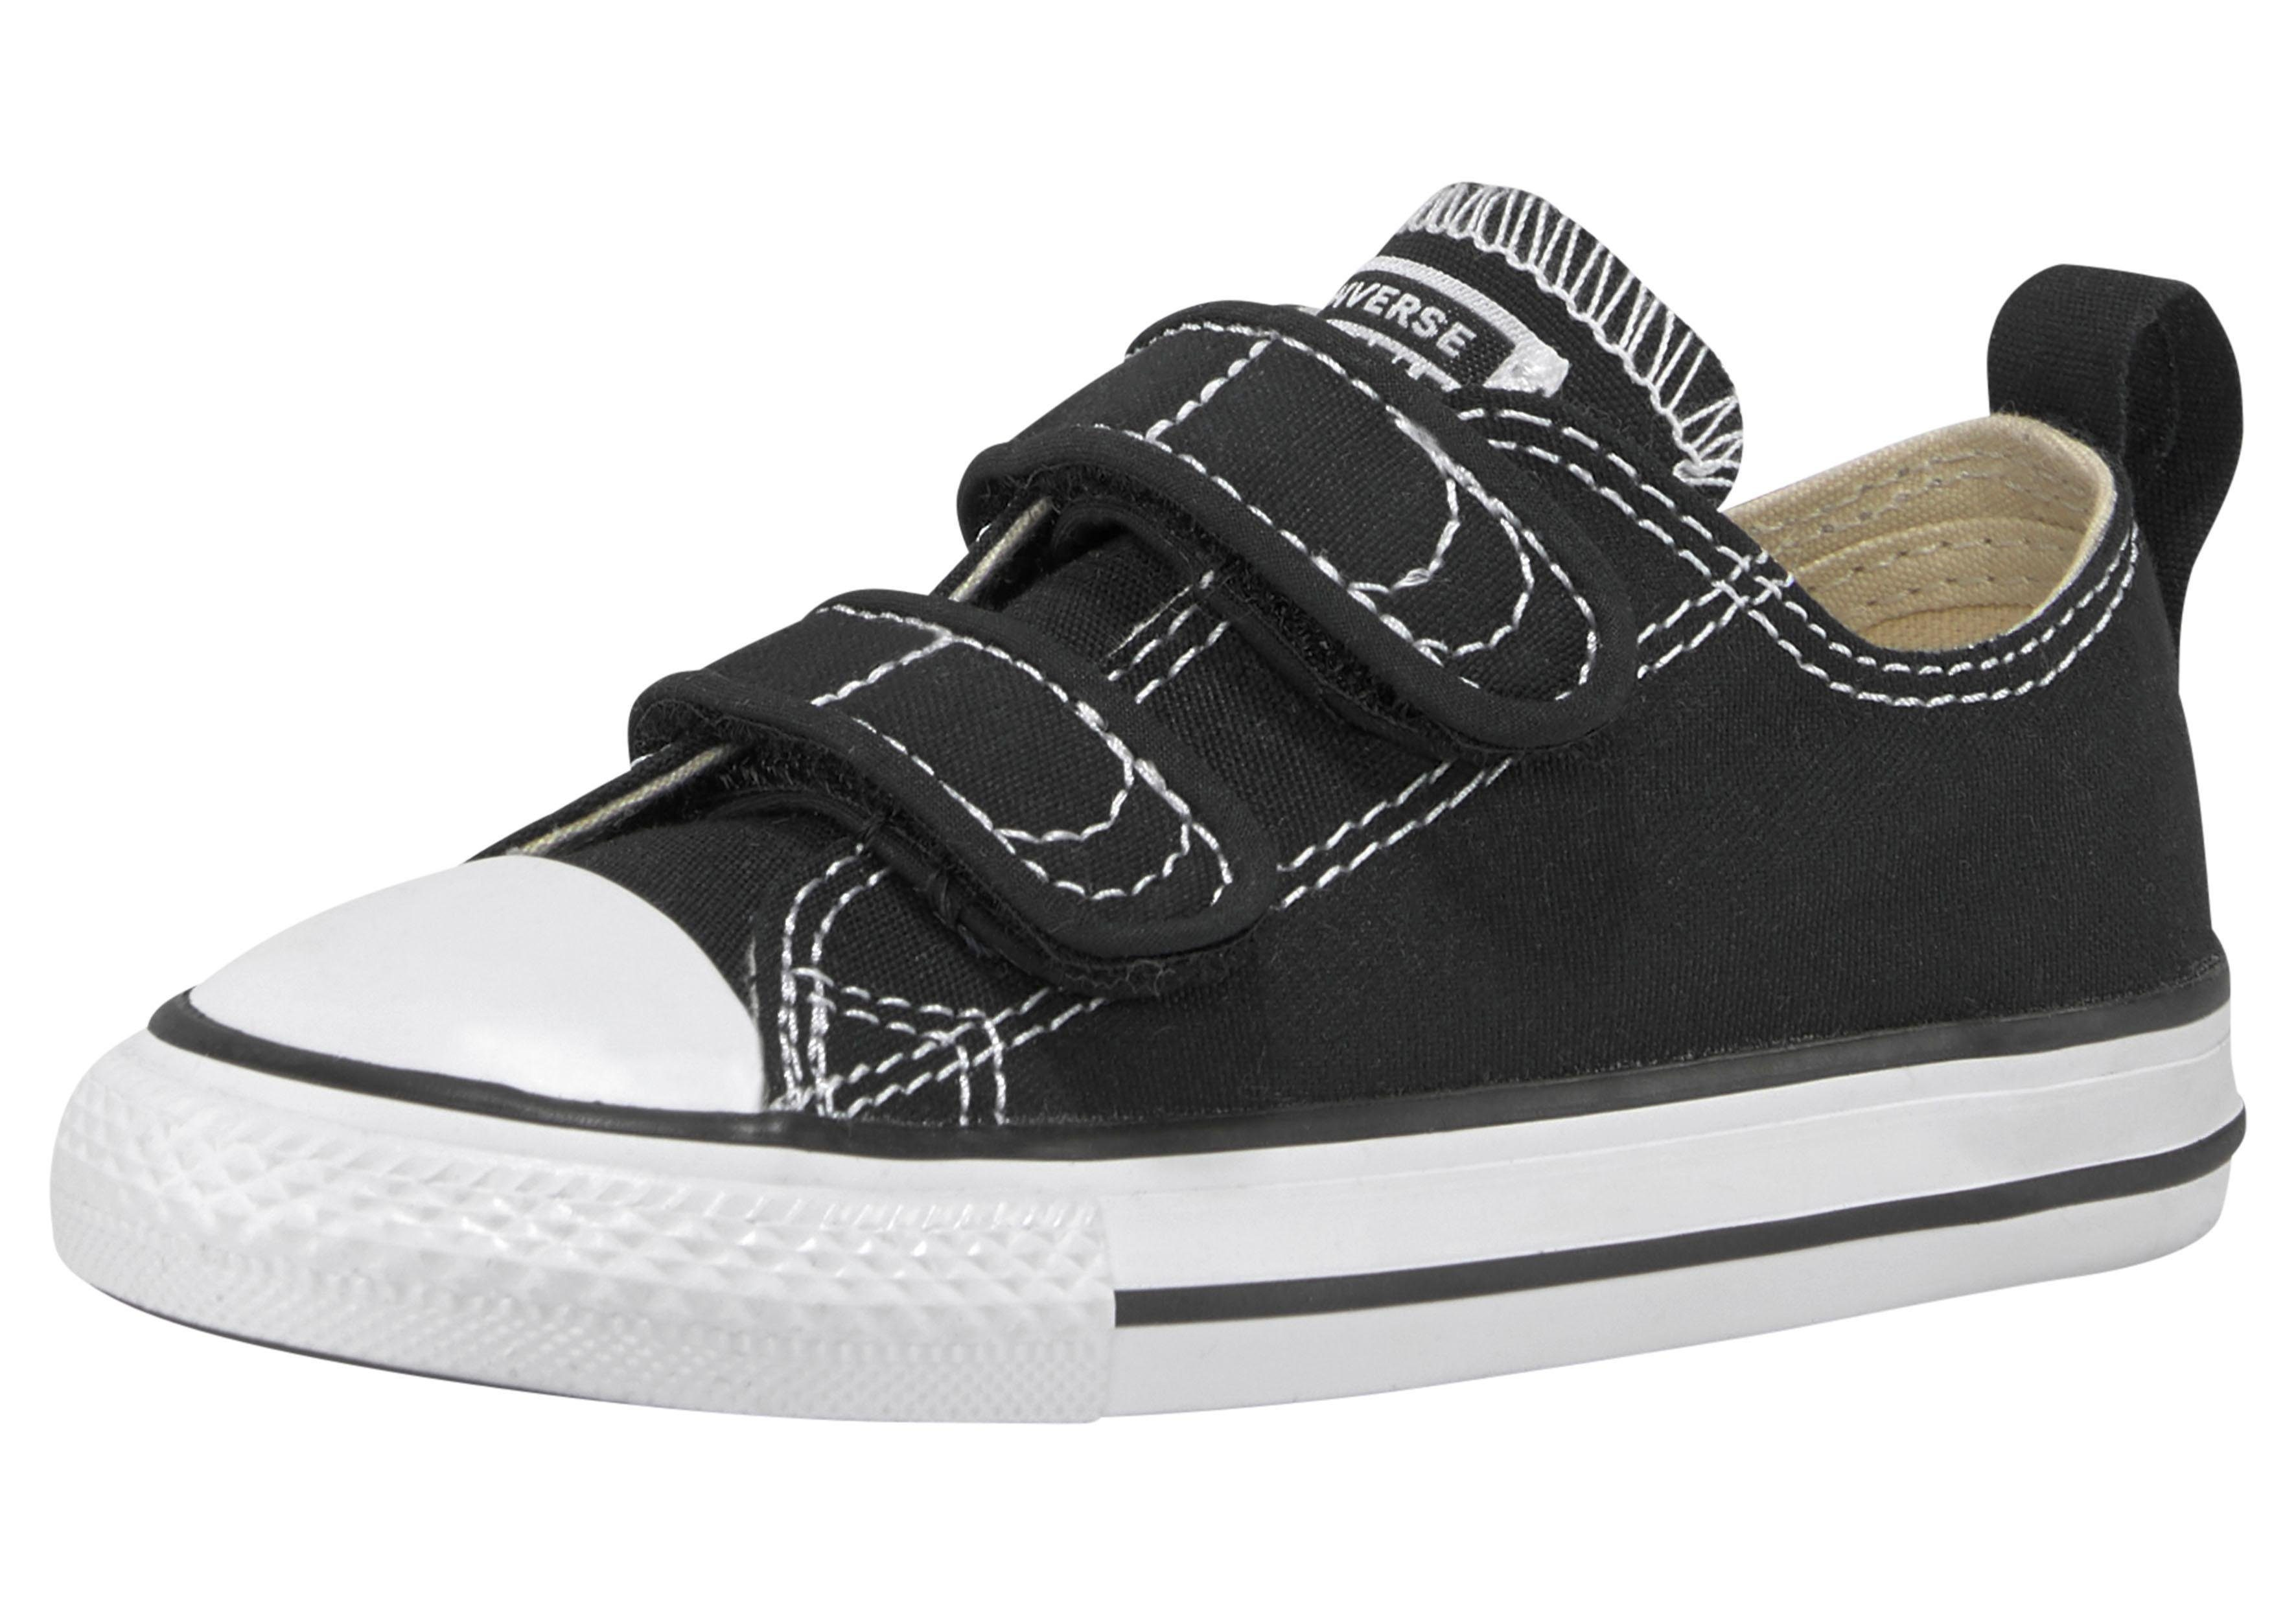 Converse »KINDER CHUCK TAYLOR ALL STAR 2V OX KLETT« Sneaker online kaufen   OTTO